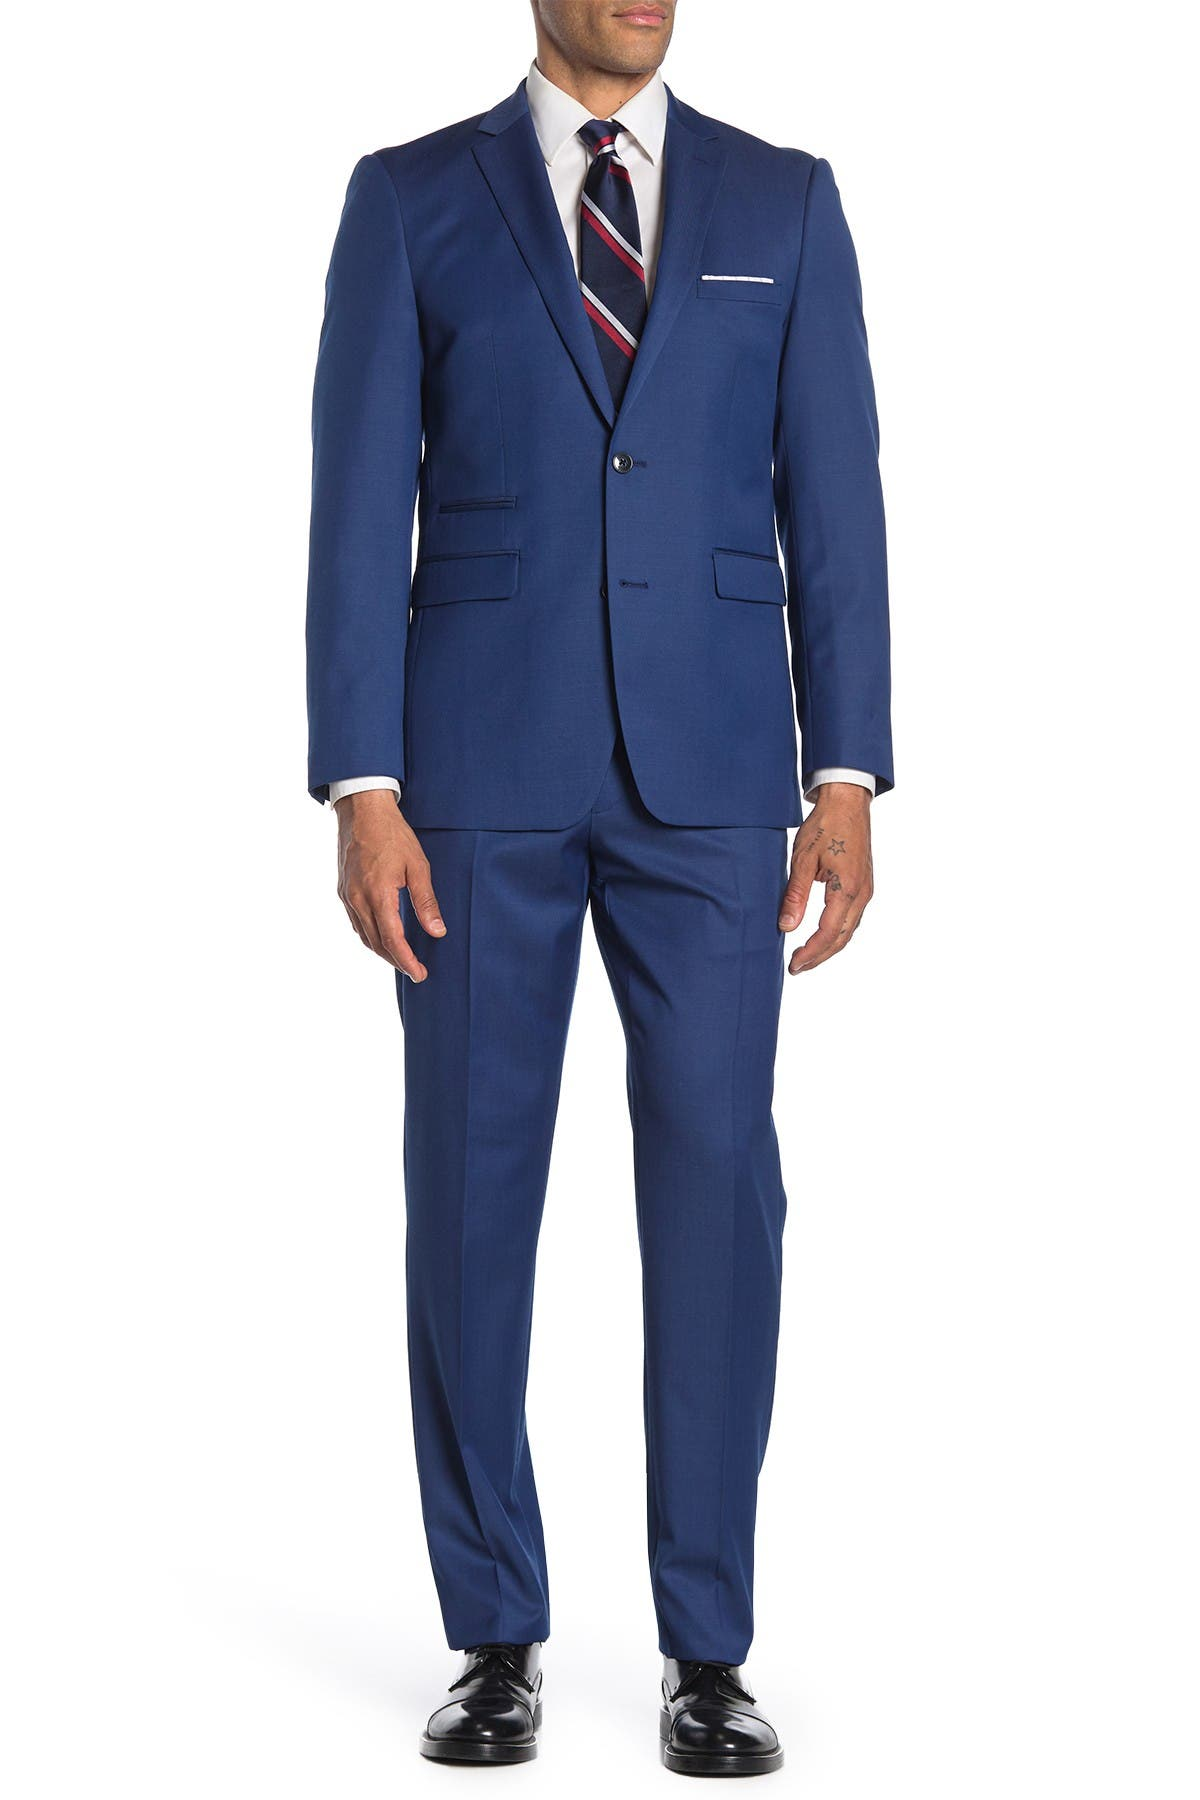 Image of Vince Camuto Medium Blue Solid Slim Fit 2-Piece Suit